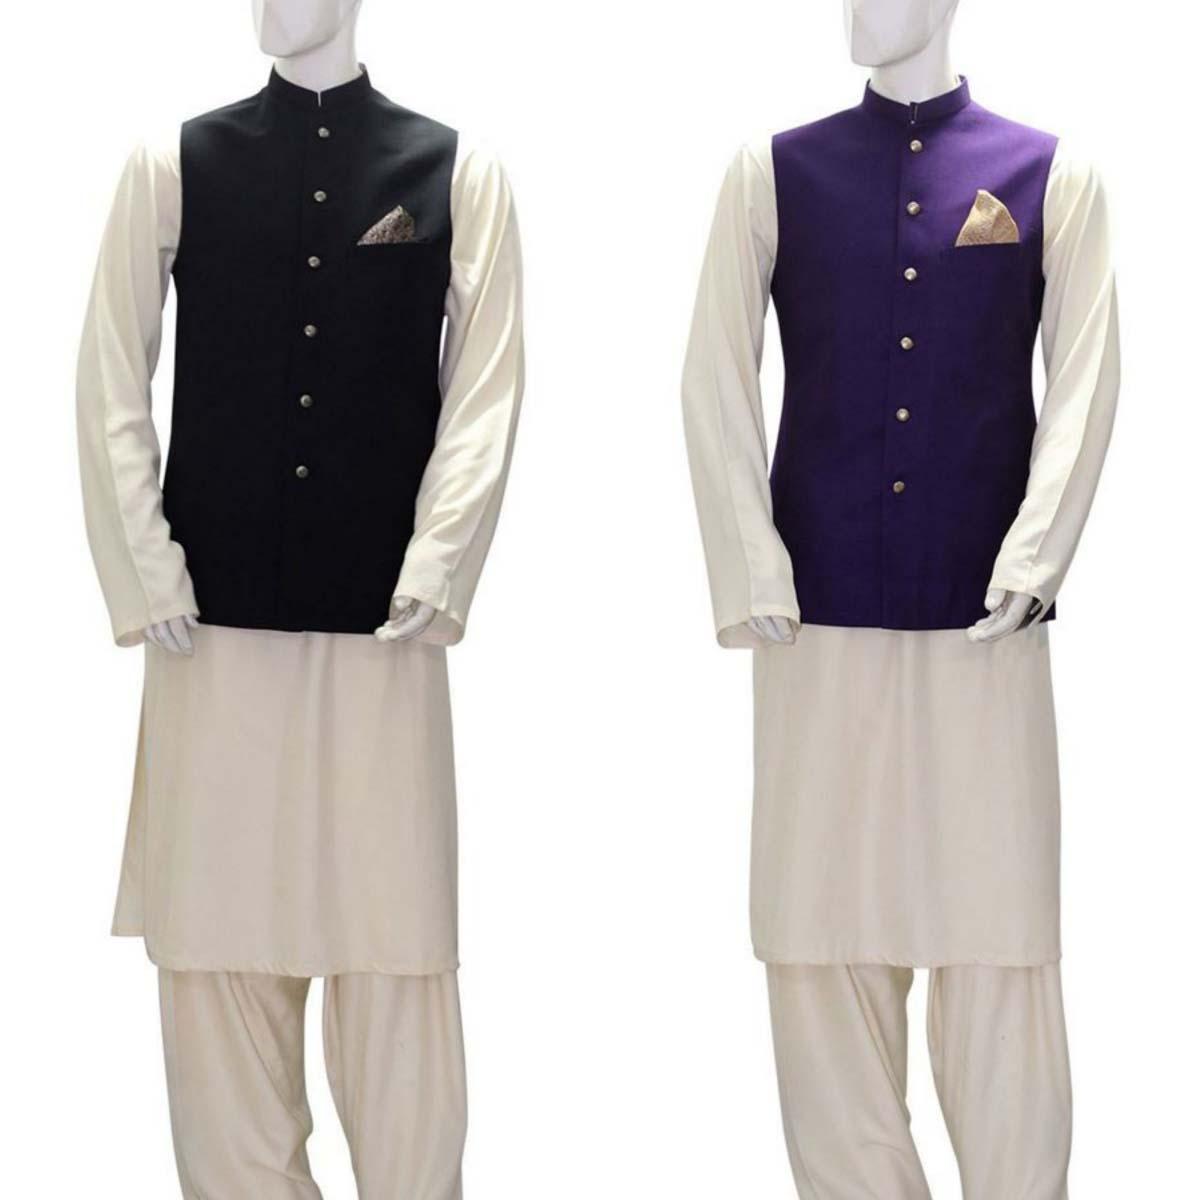 Deepak perwani Luxury Pret Eid Collection for Men and Women 2016-2017 (10)